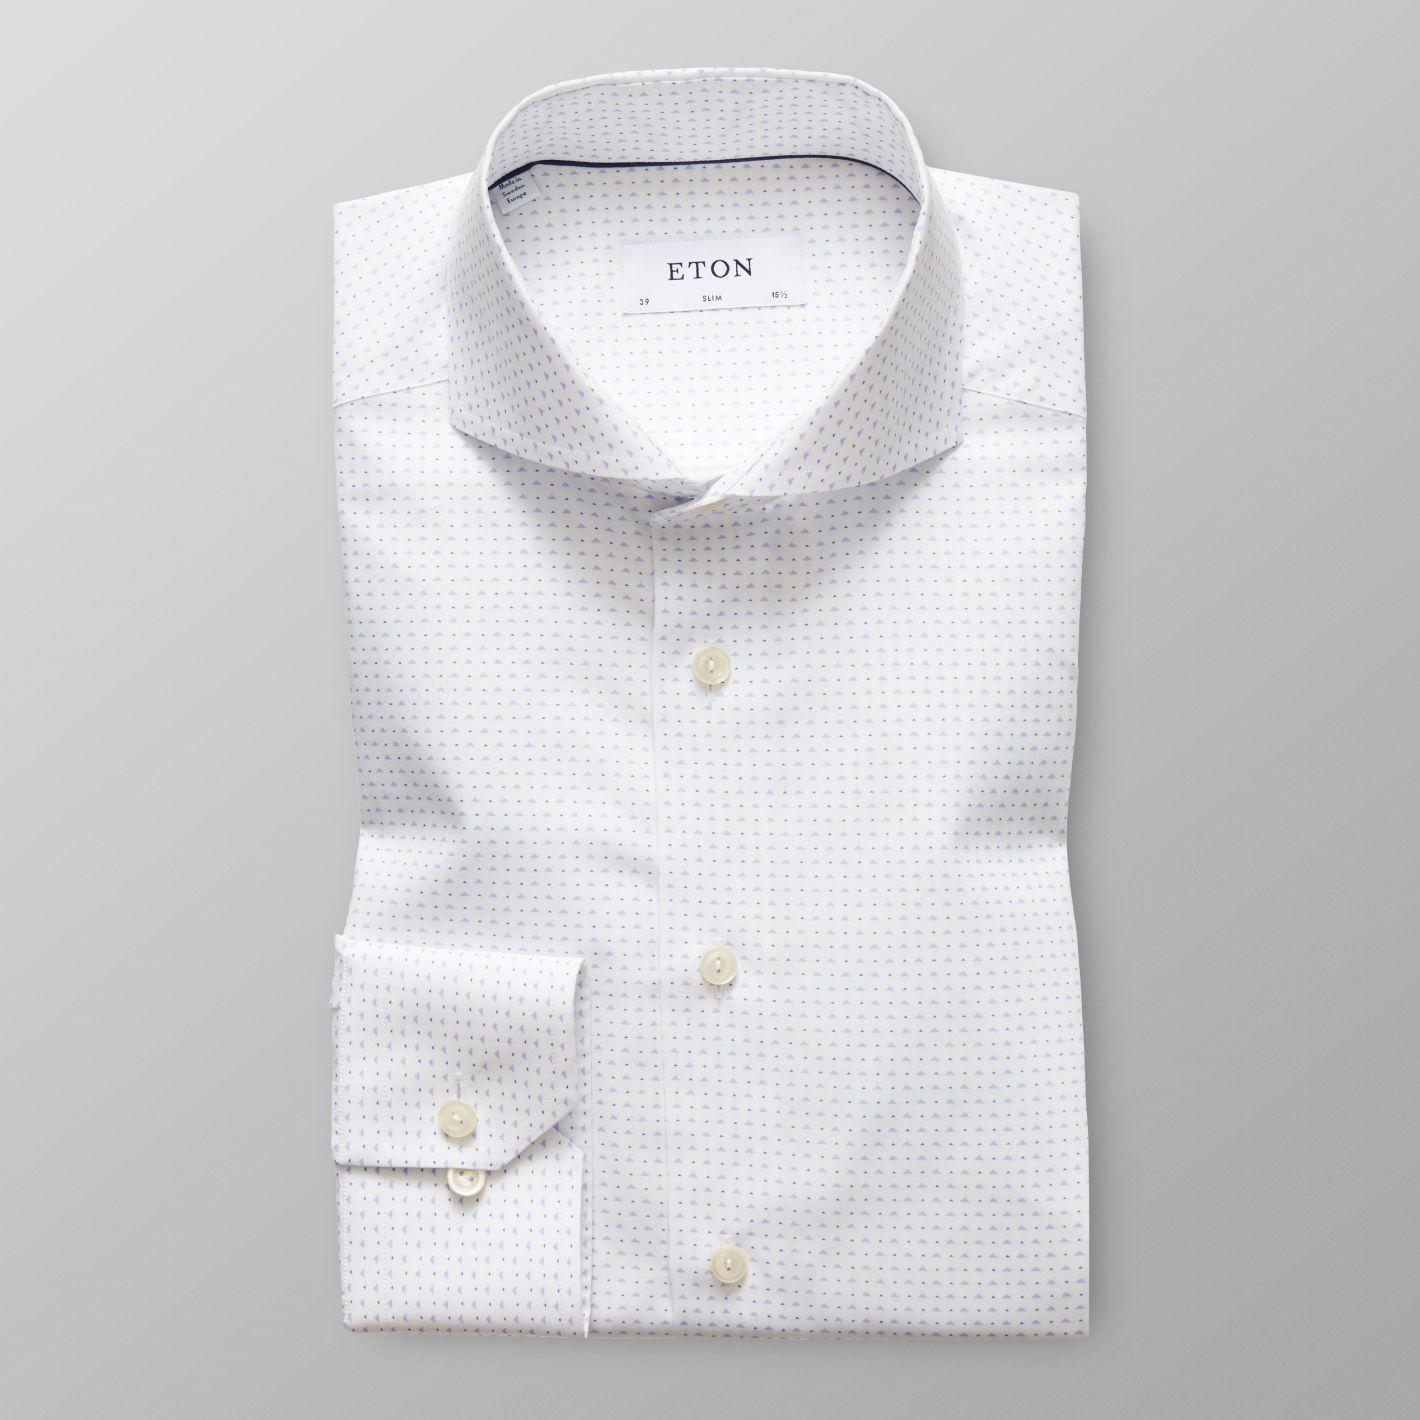 White Micro Print Shirt